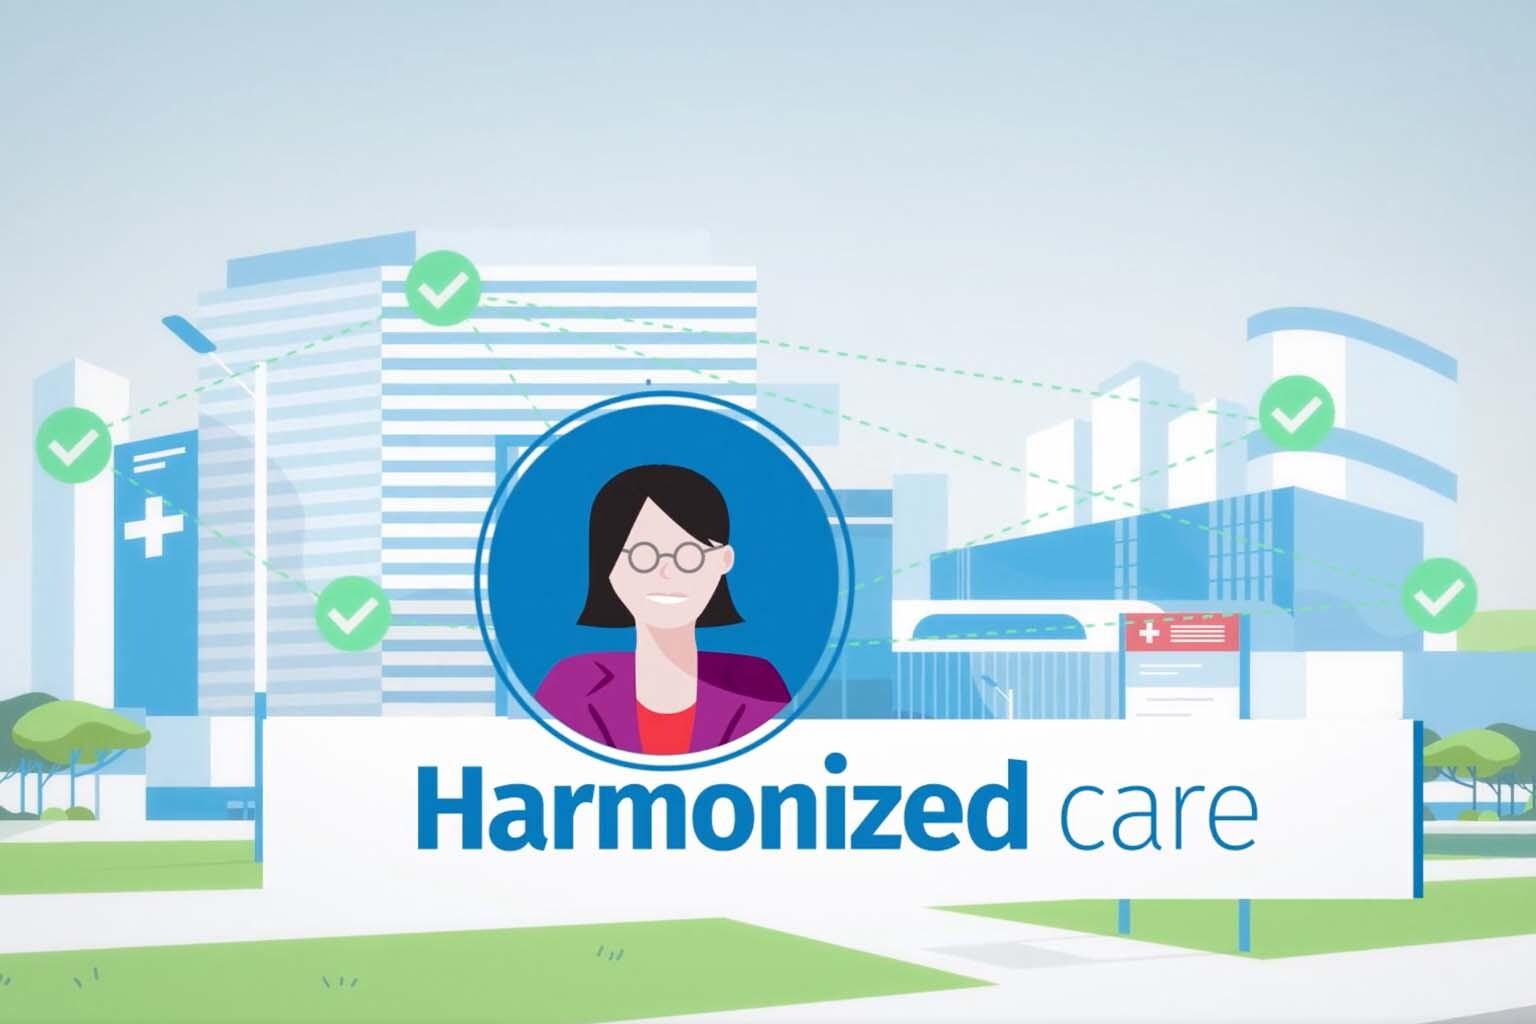 video screen - harmonized care